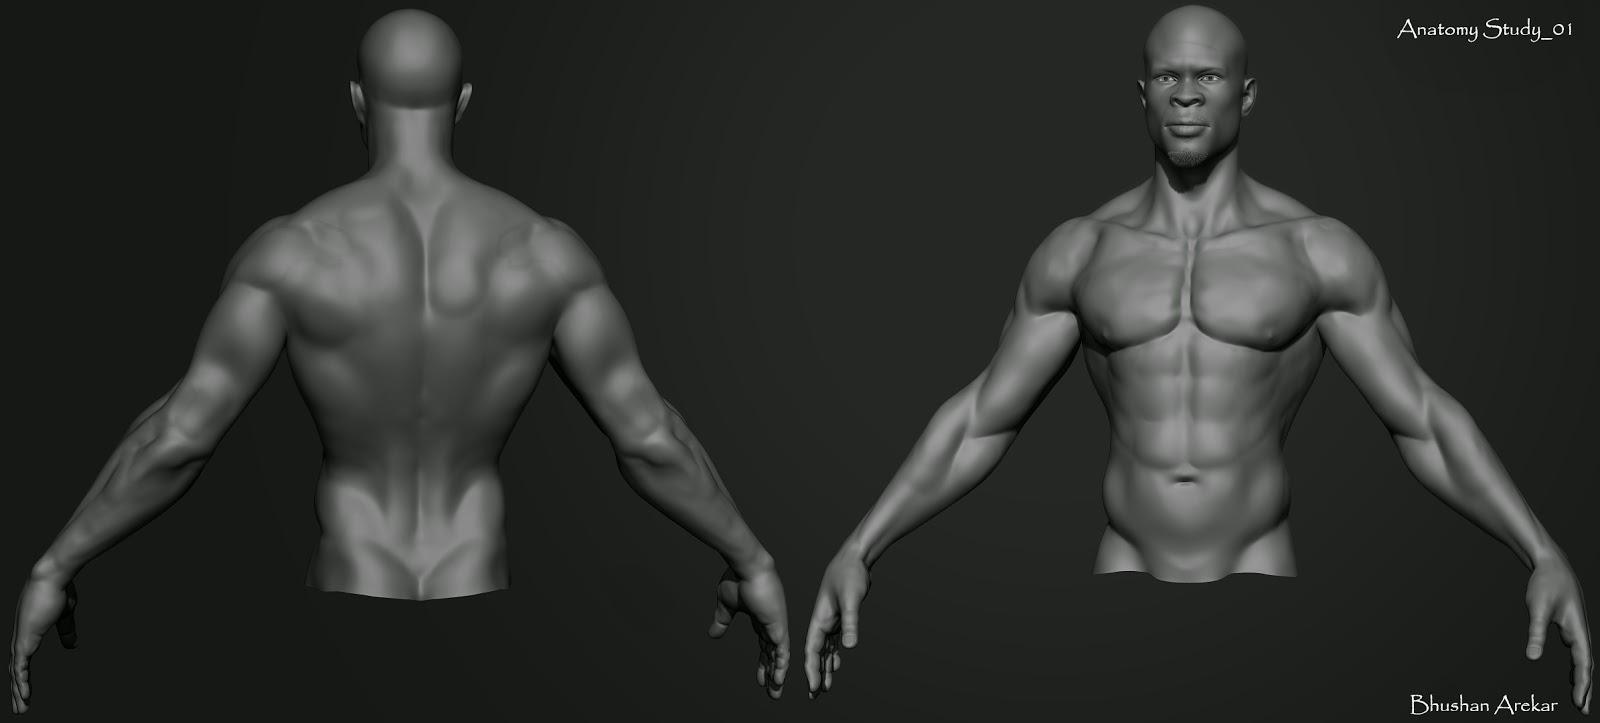 Anatomy+Study_01a.jpg